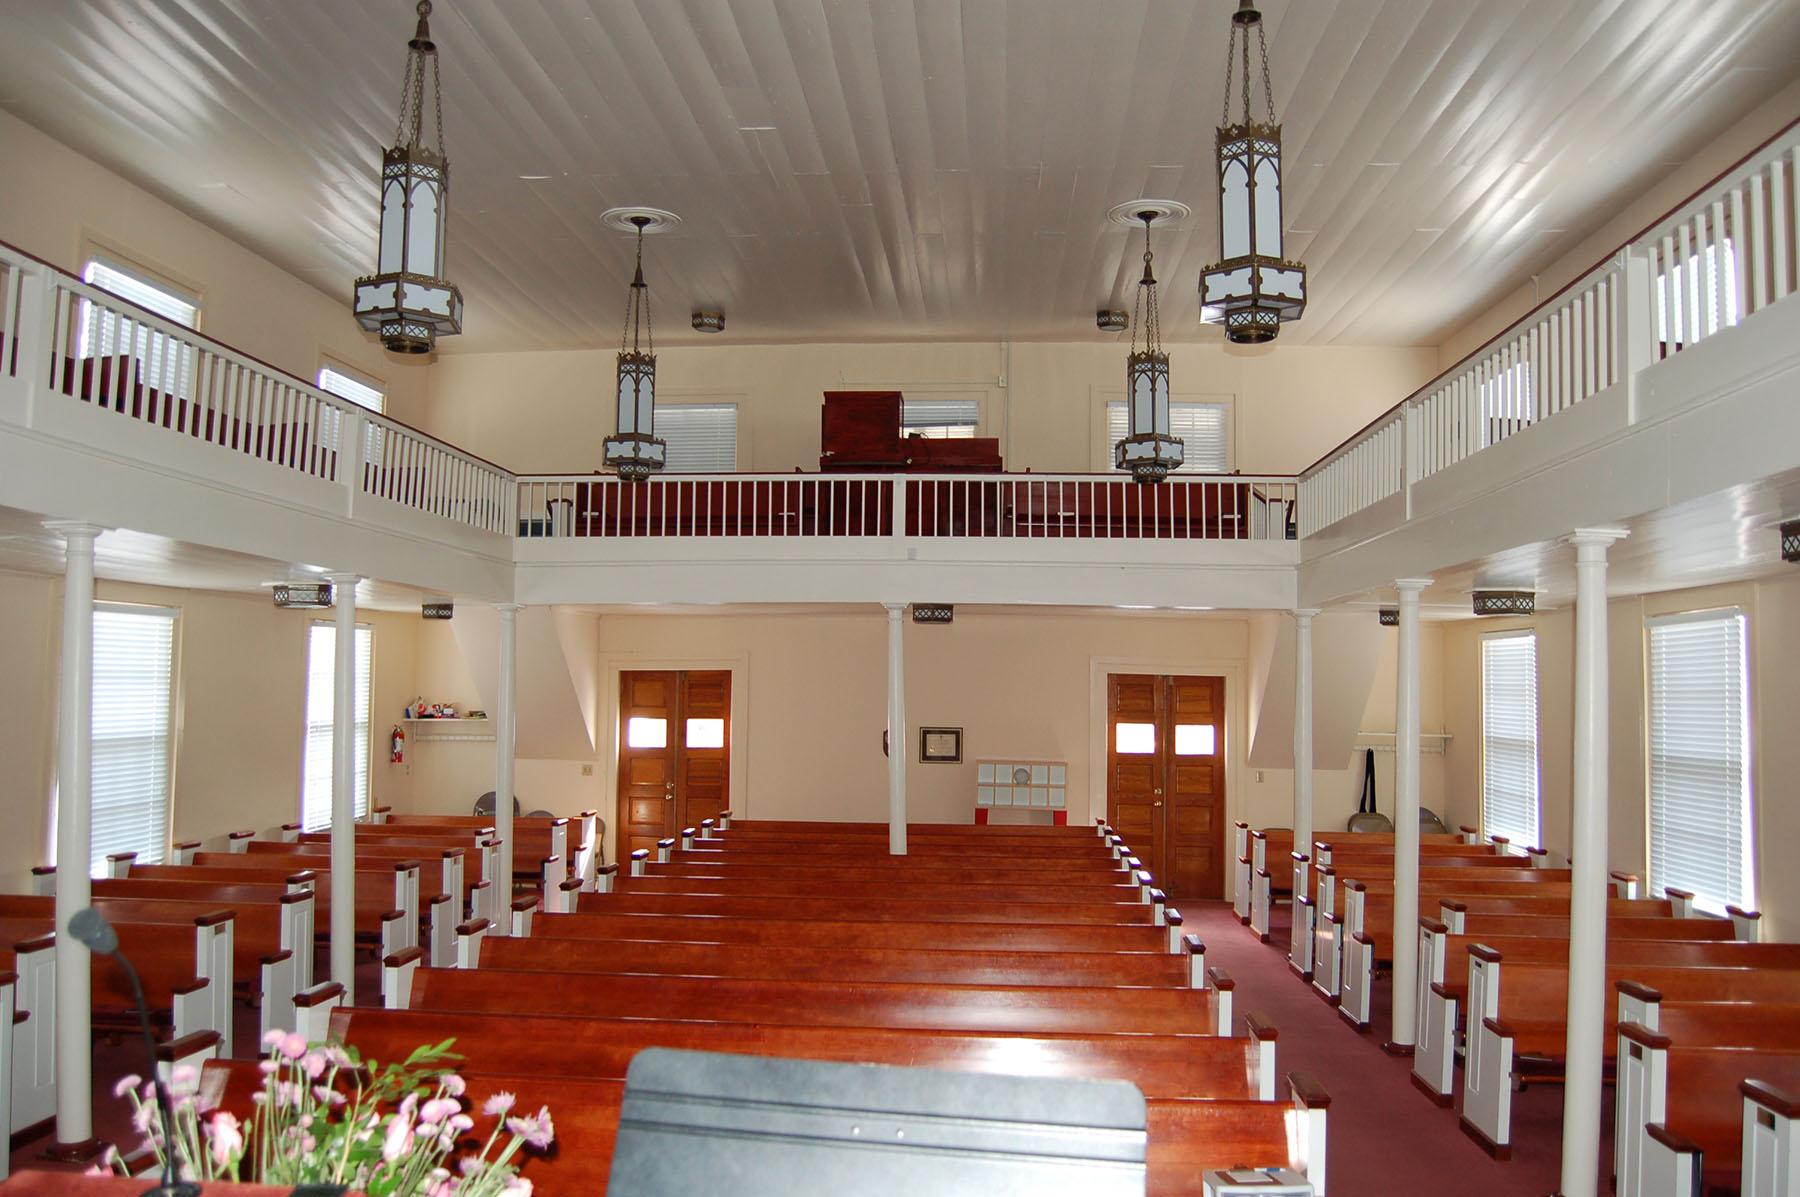 Interior of Sandy Level Baptist Church showing slave balconies.